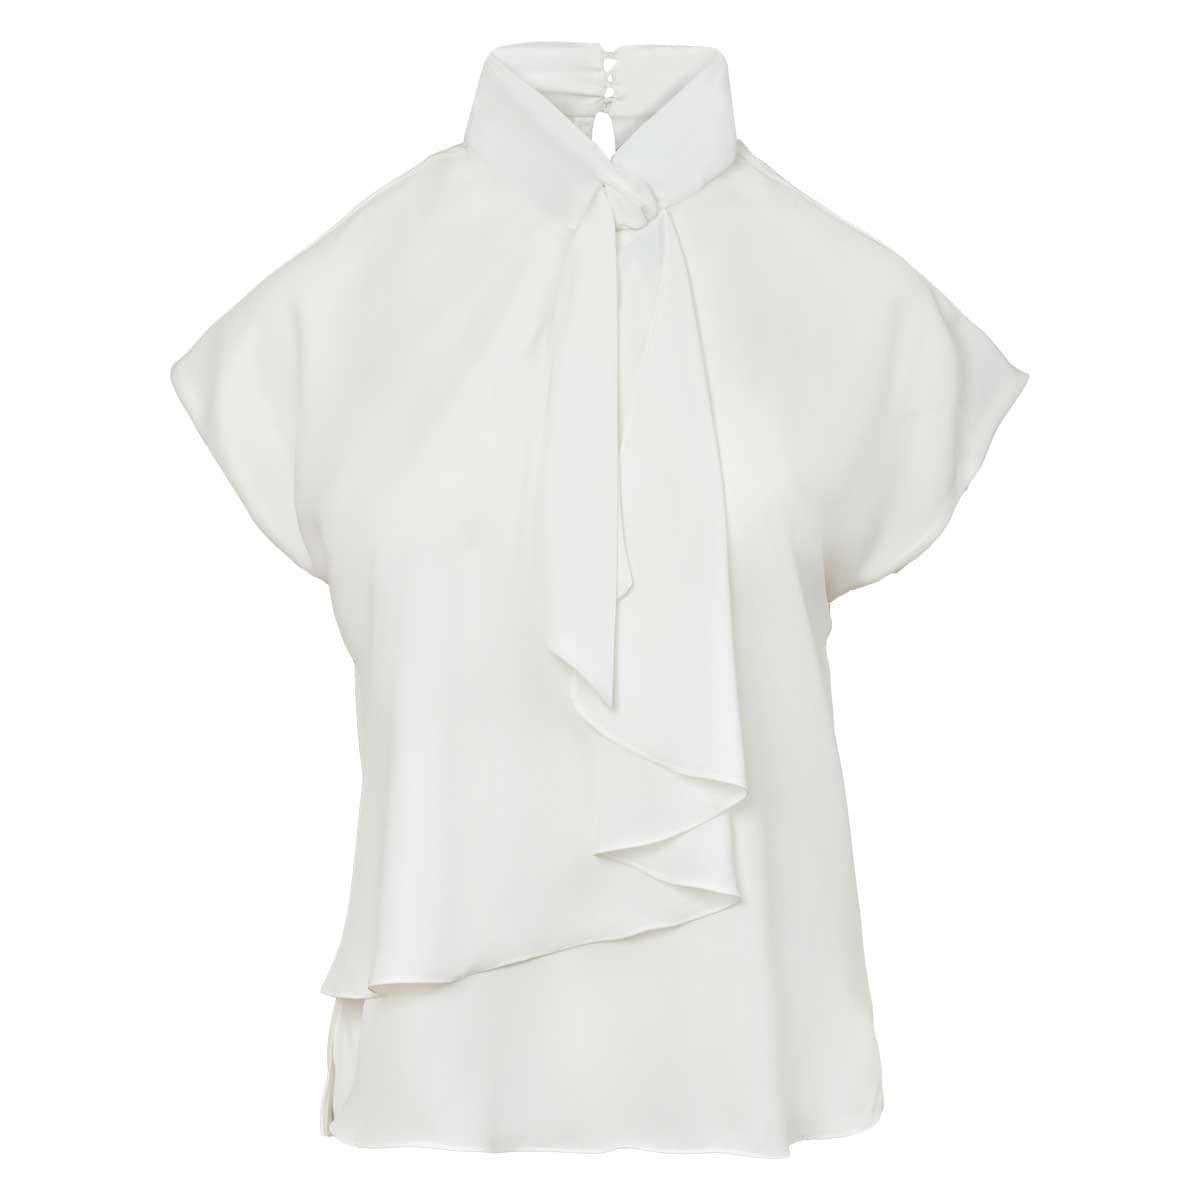 Blusa Lisa Blanca Ann Miller